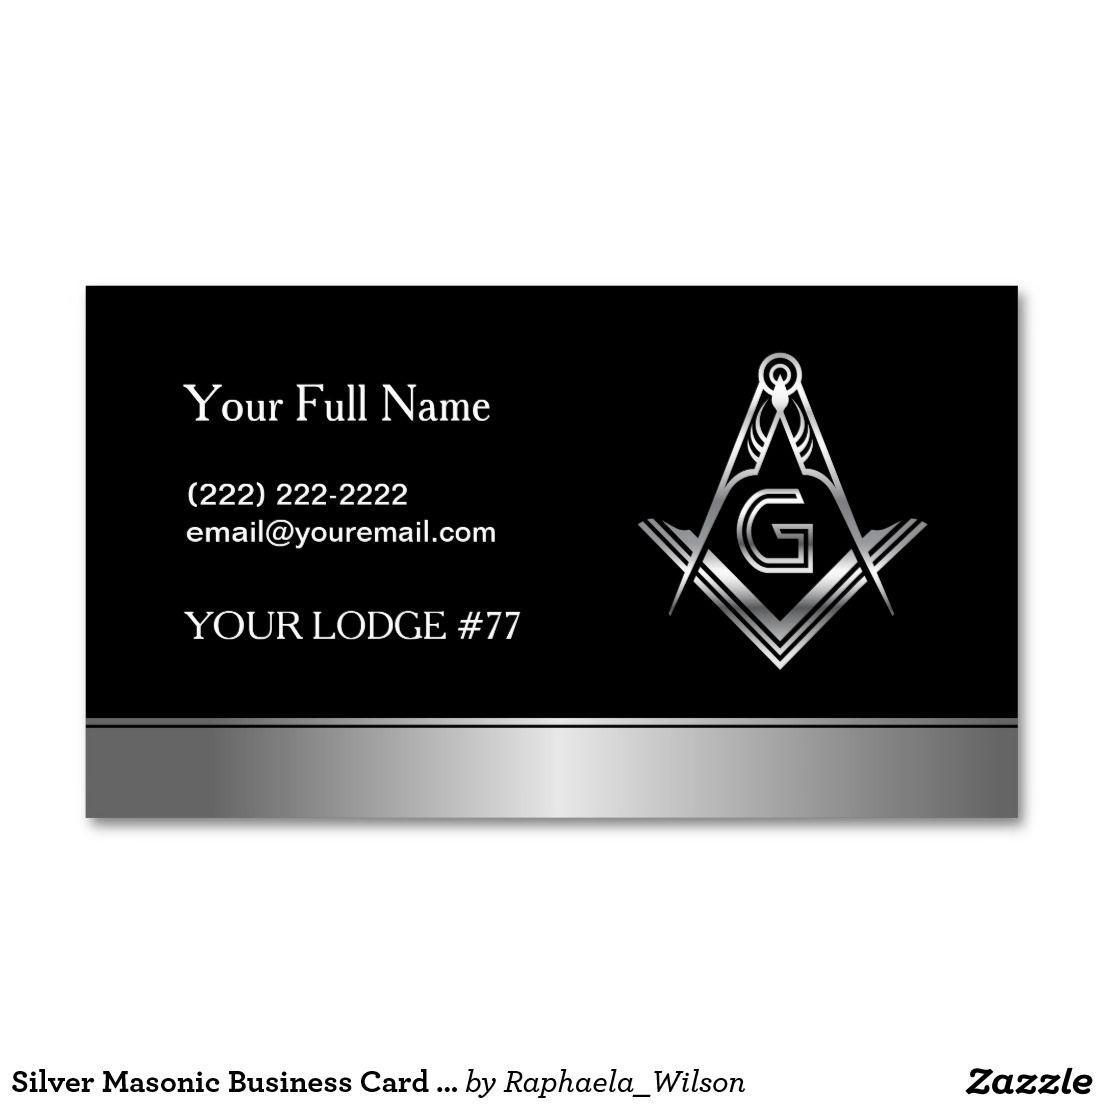 Silver masonic business card template freemason custom for Freemason business cards